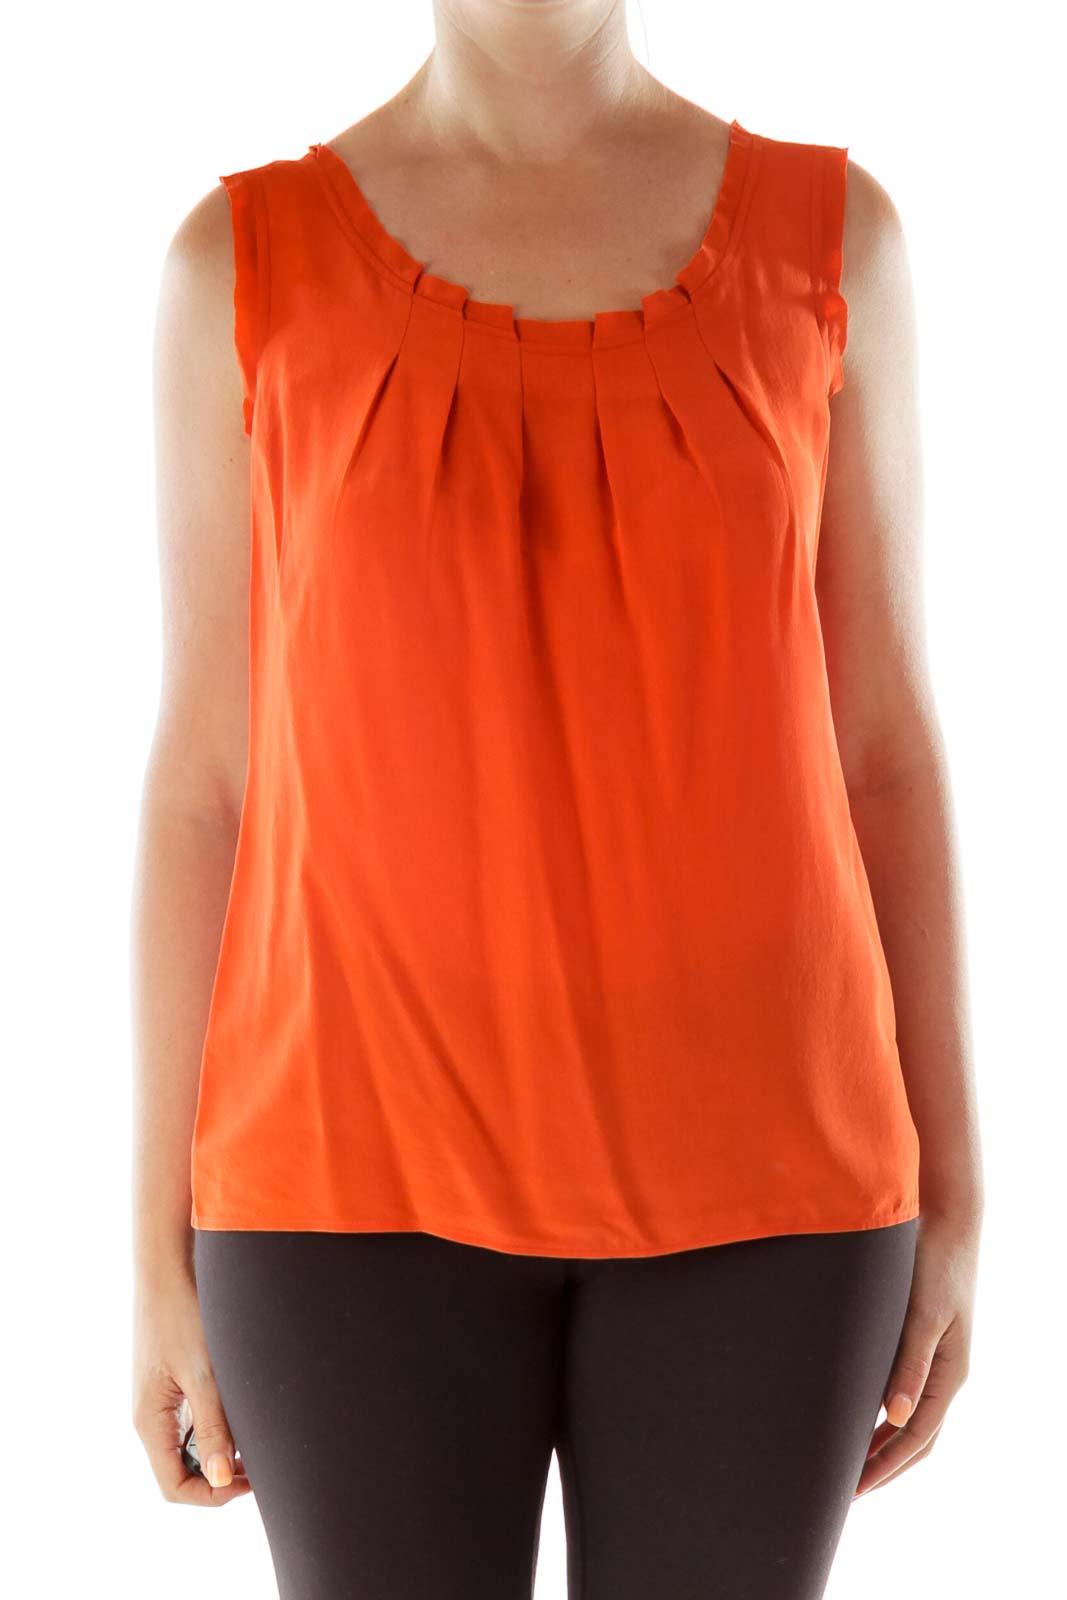 Orange Pleated Tank Top